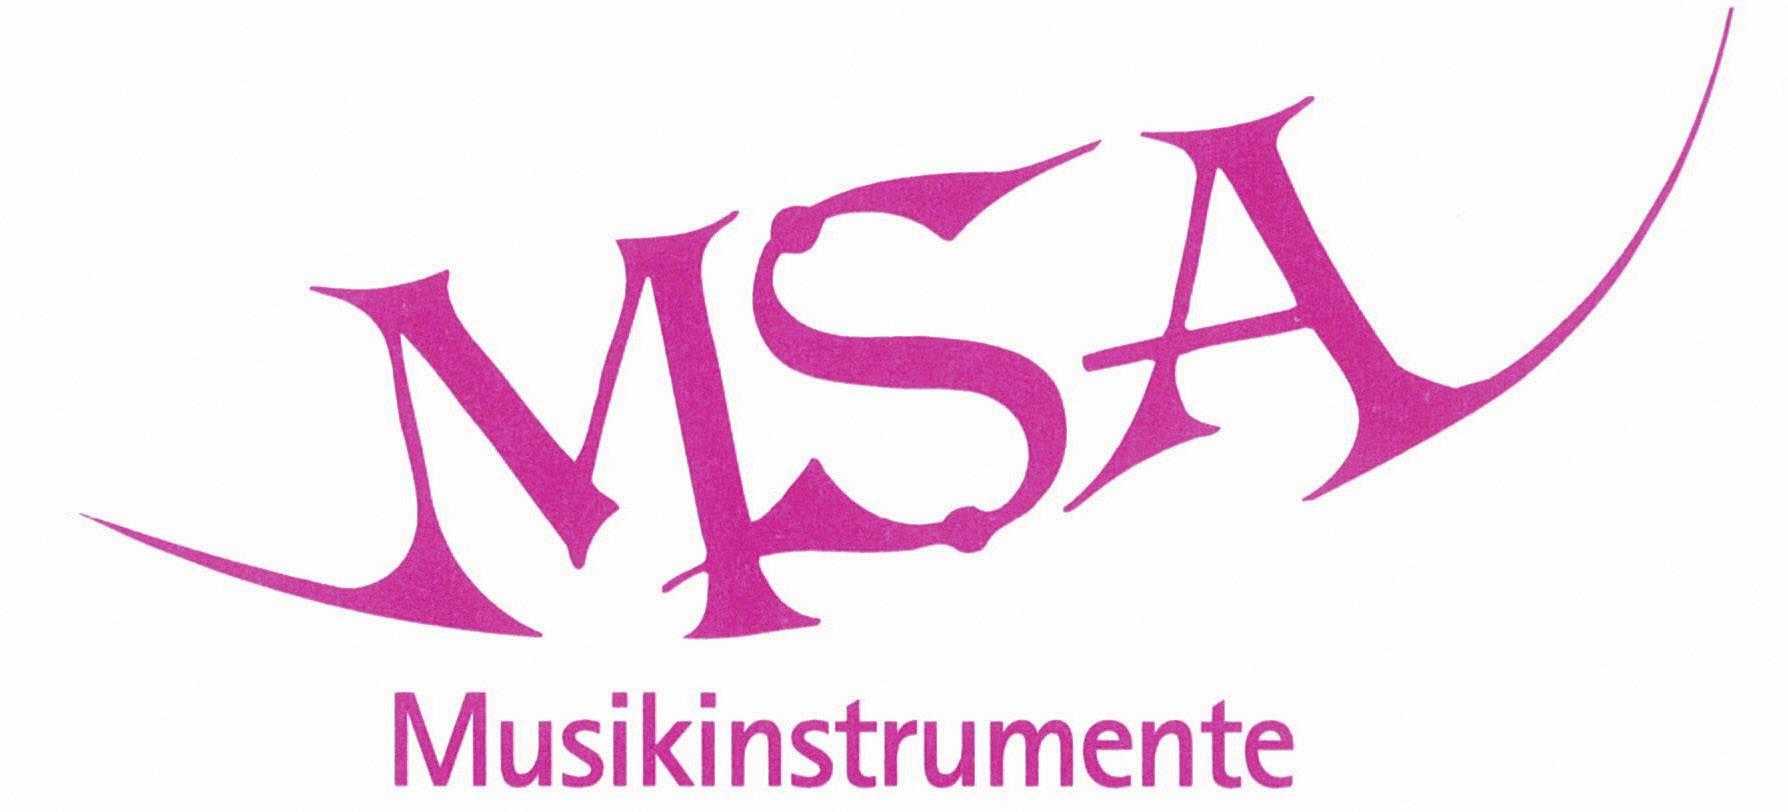 MSA Musikinstrumente